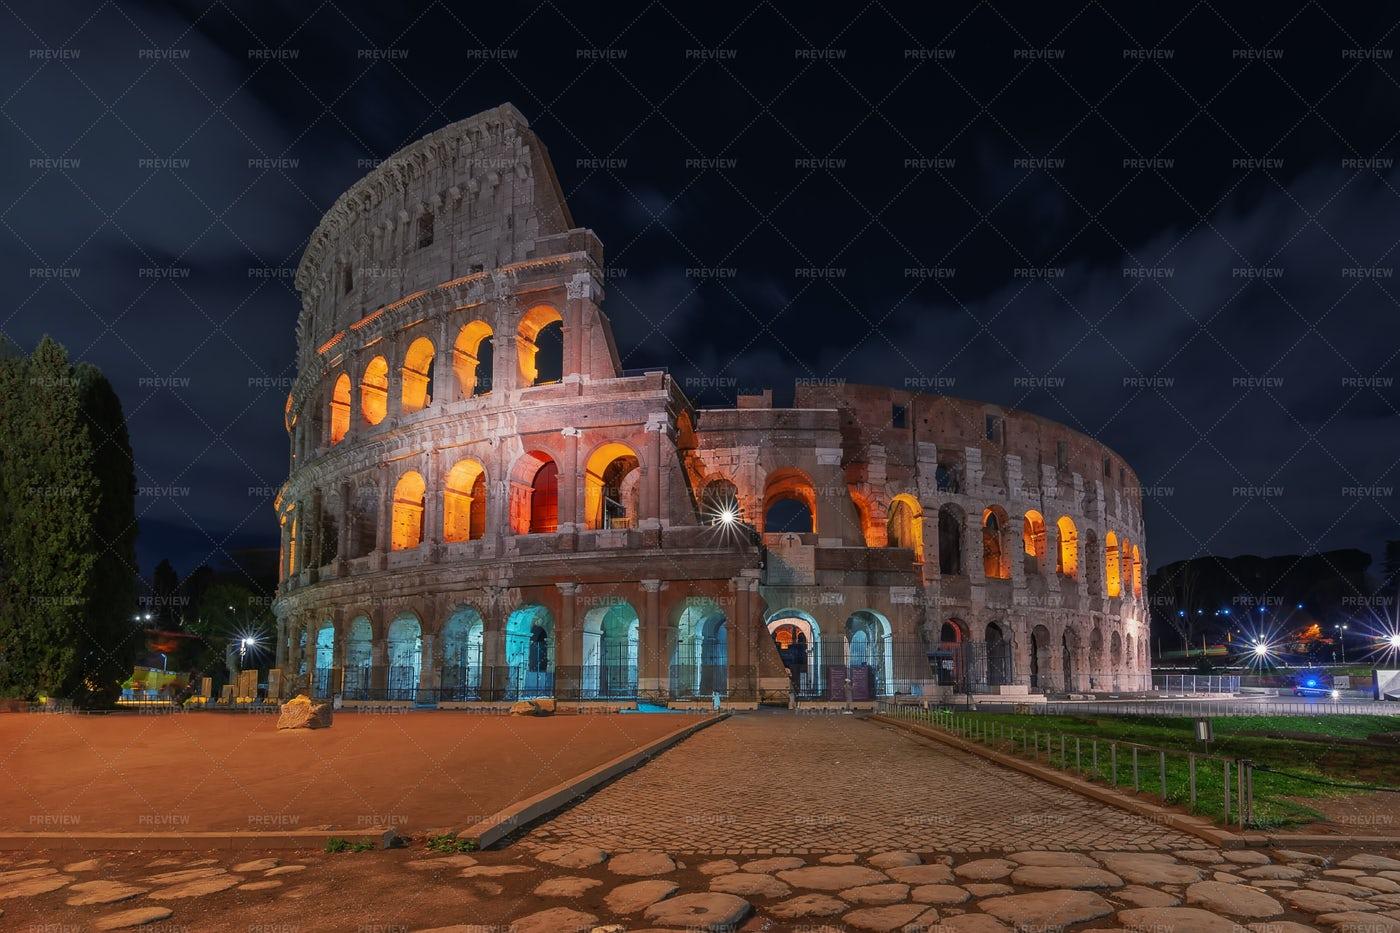 Roman Colosseum At Night: Stock Photos